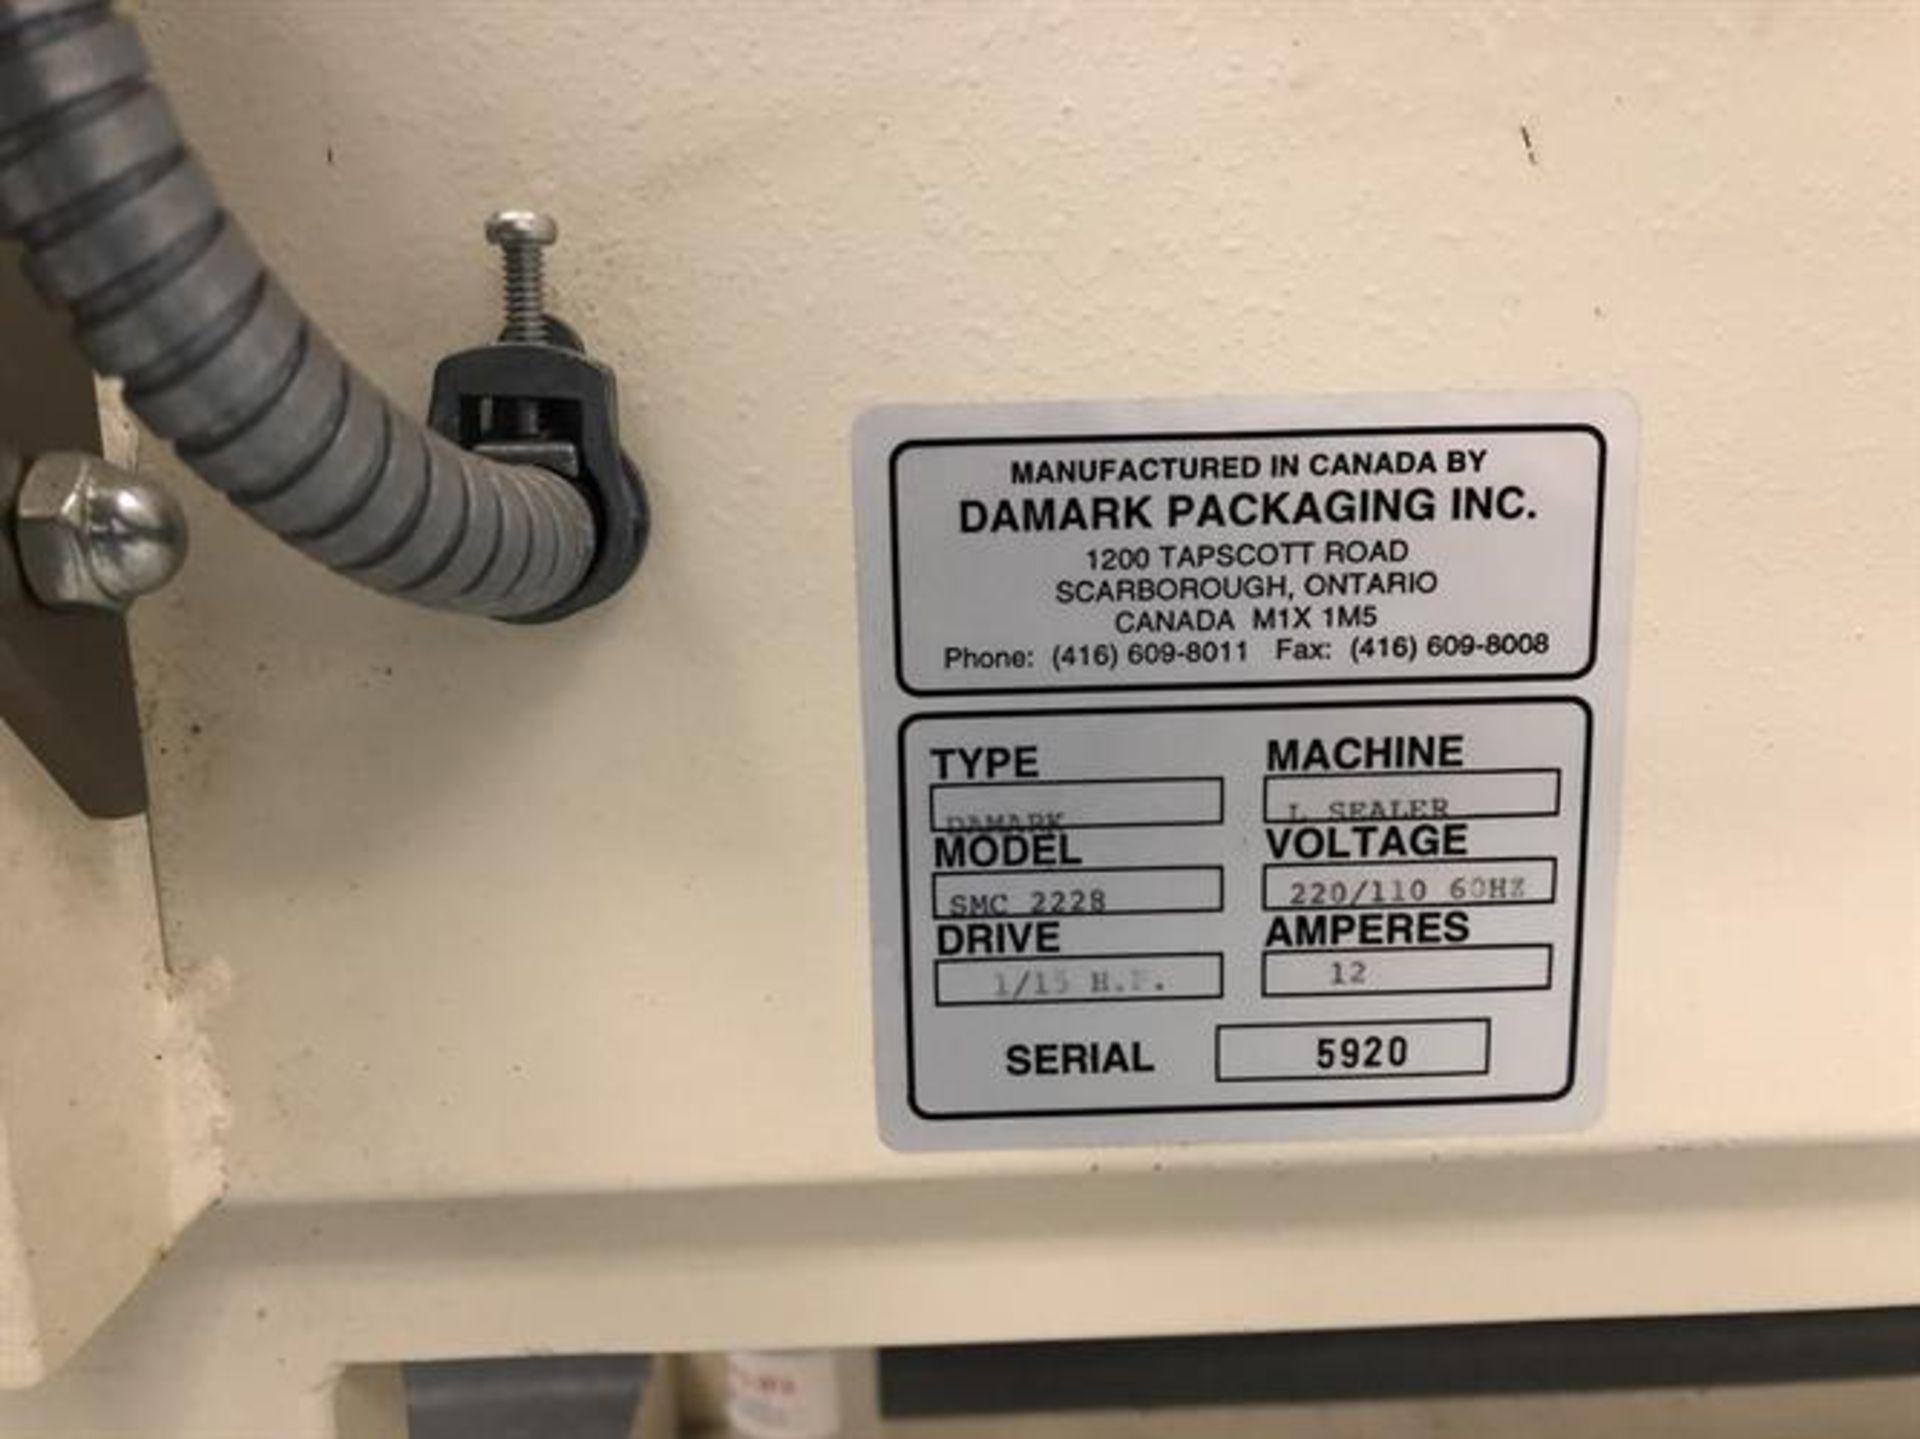 "Damark model SMC 2228 L-Bar Sealer - 22"" x 28"" sealing area - Timers and controls - Take away belt - Image 4 of 5"